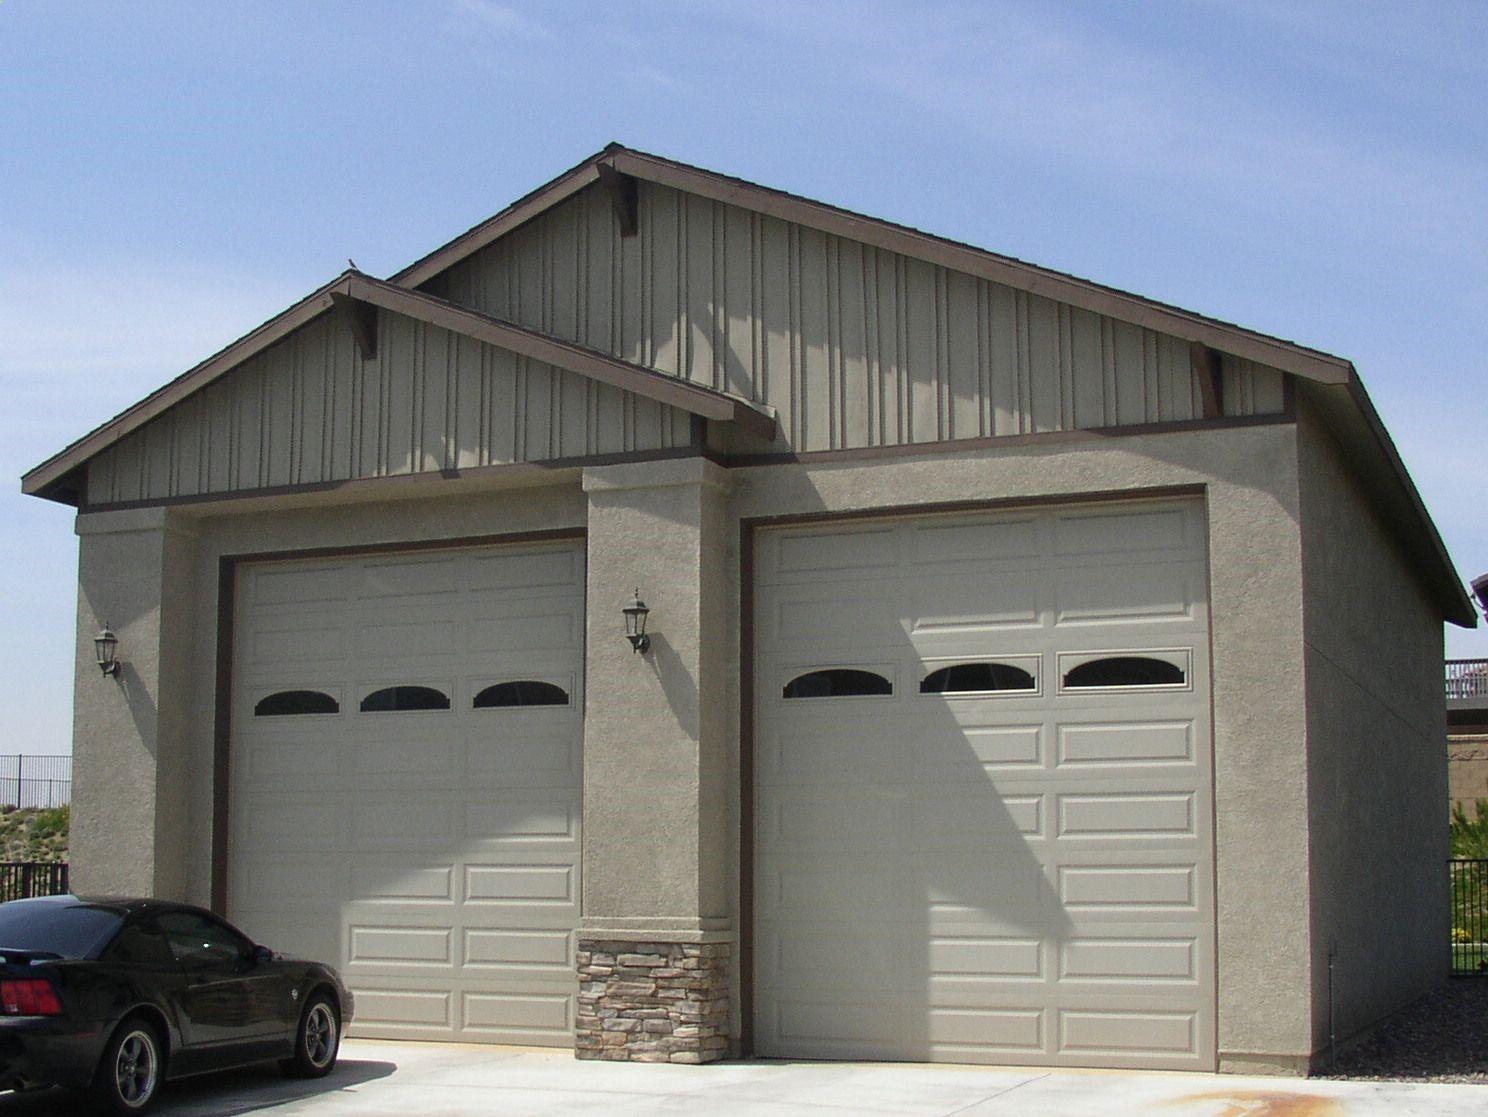 Rv Garage And Shop Plans Garage Plans 2 G469 24 X 30 X 9 2 Car Garage Plans With Attic Storage Rv Garage Garage With Living Quarters Rv Garage Plans